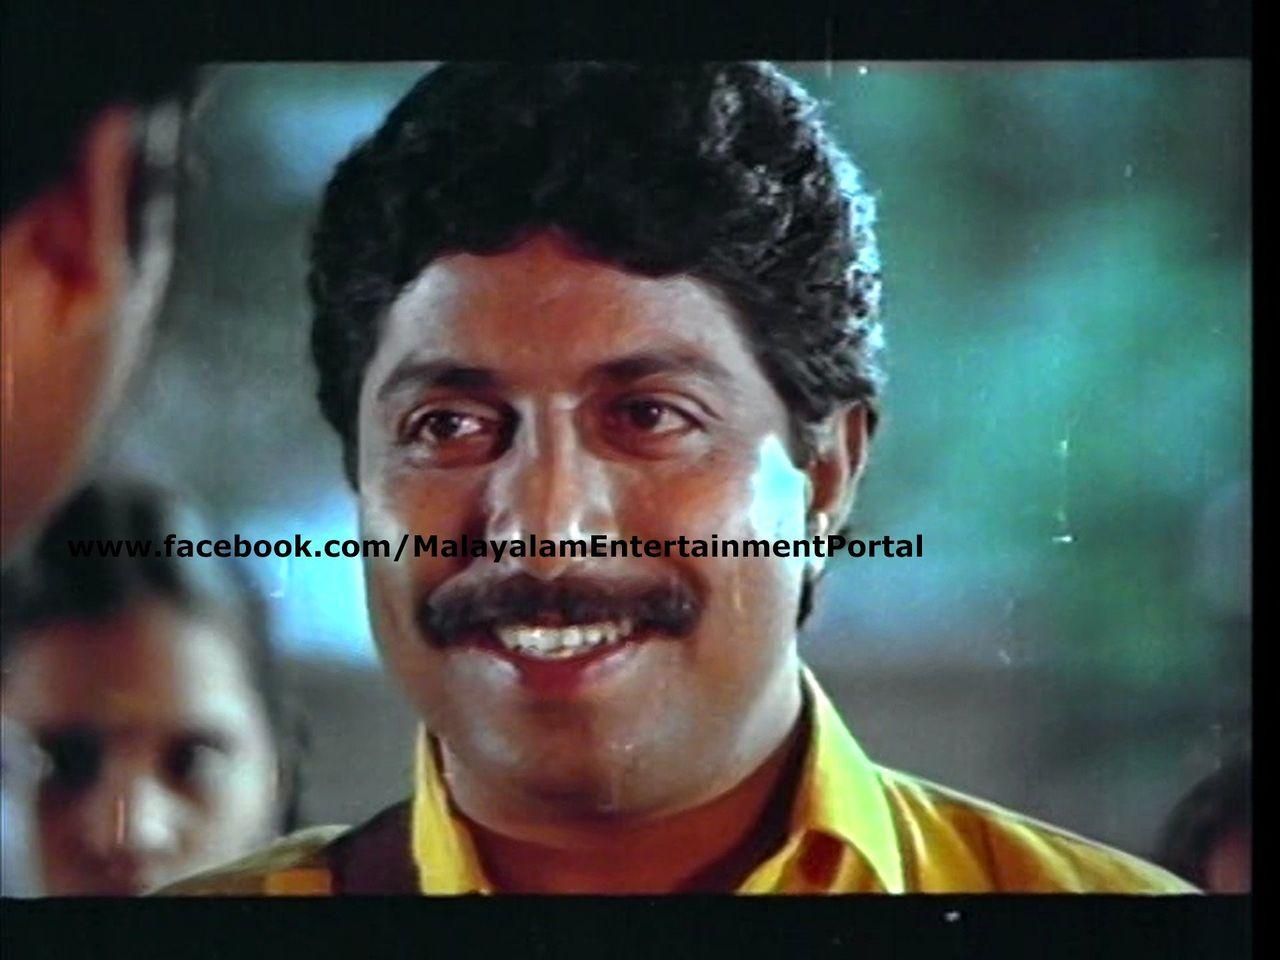 Mukundetta Sumithra Vilikyunnu Saina DVD Screenshots Bscap0005